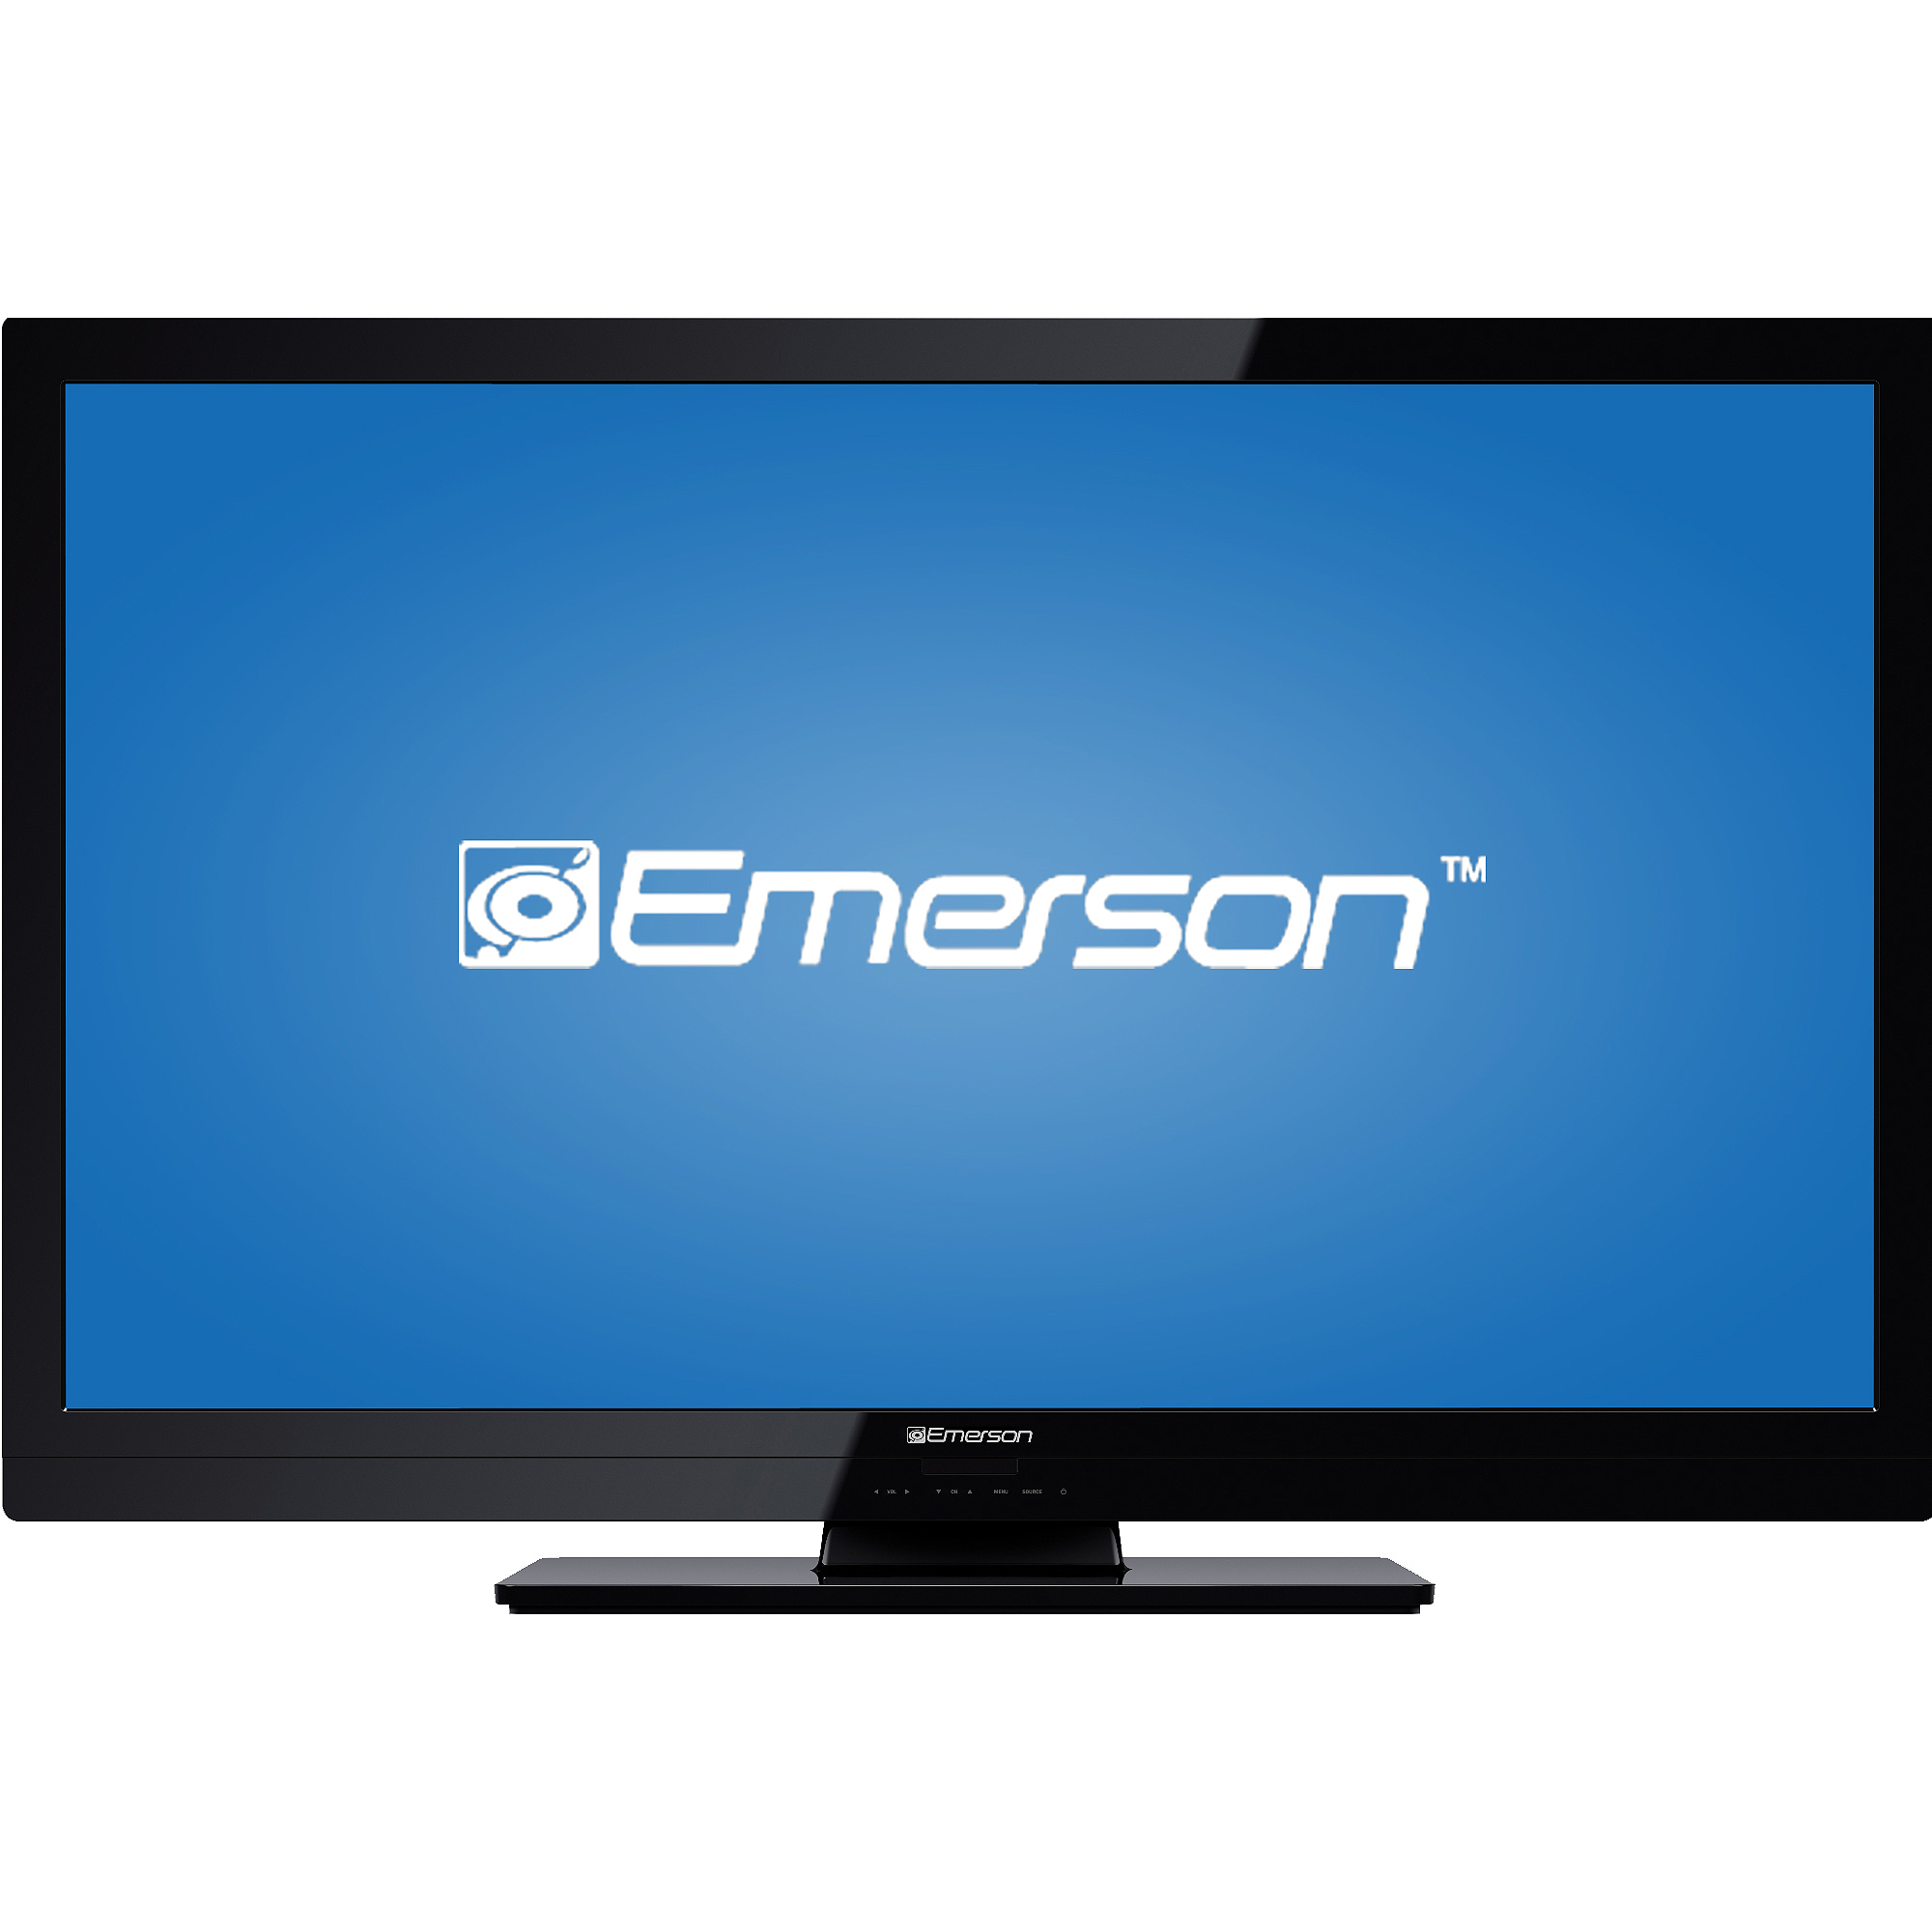 "Emerson 39"" Class LCD 1080p 60Hz HDTV, LC391EM3"